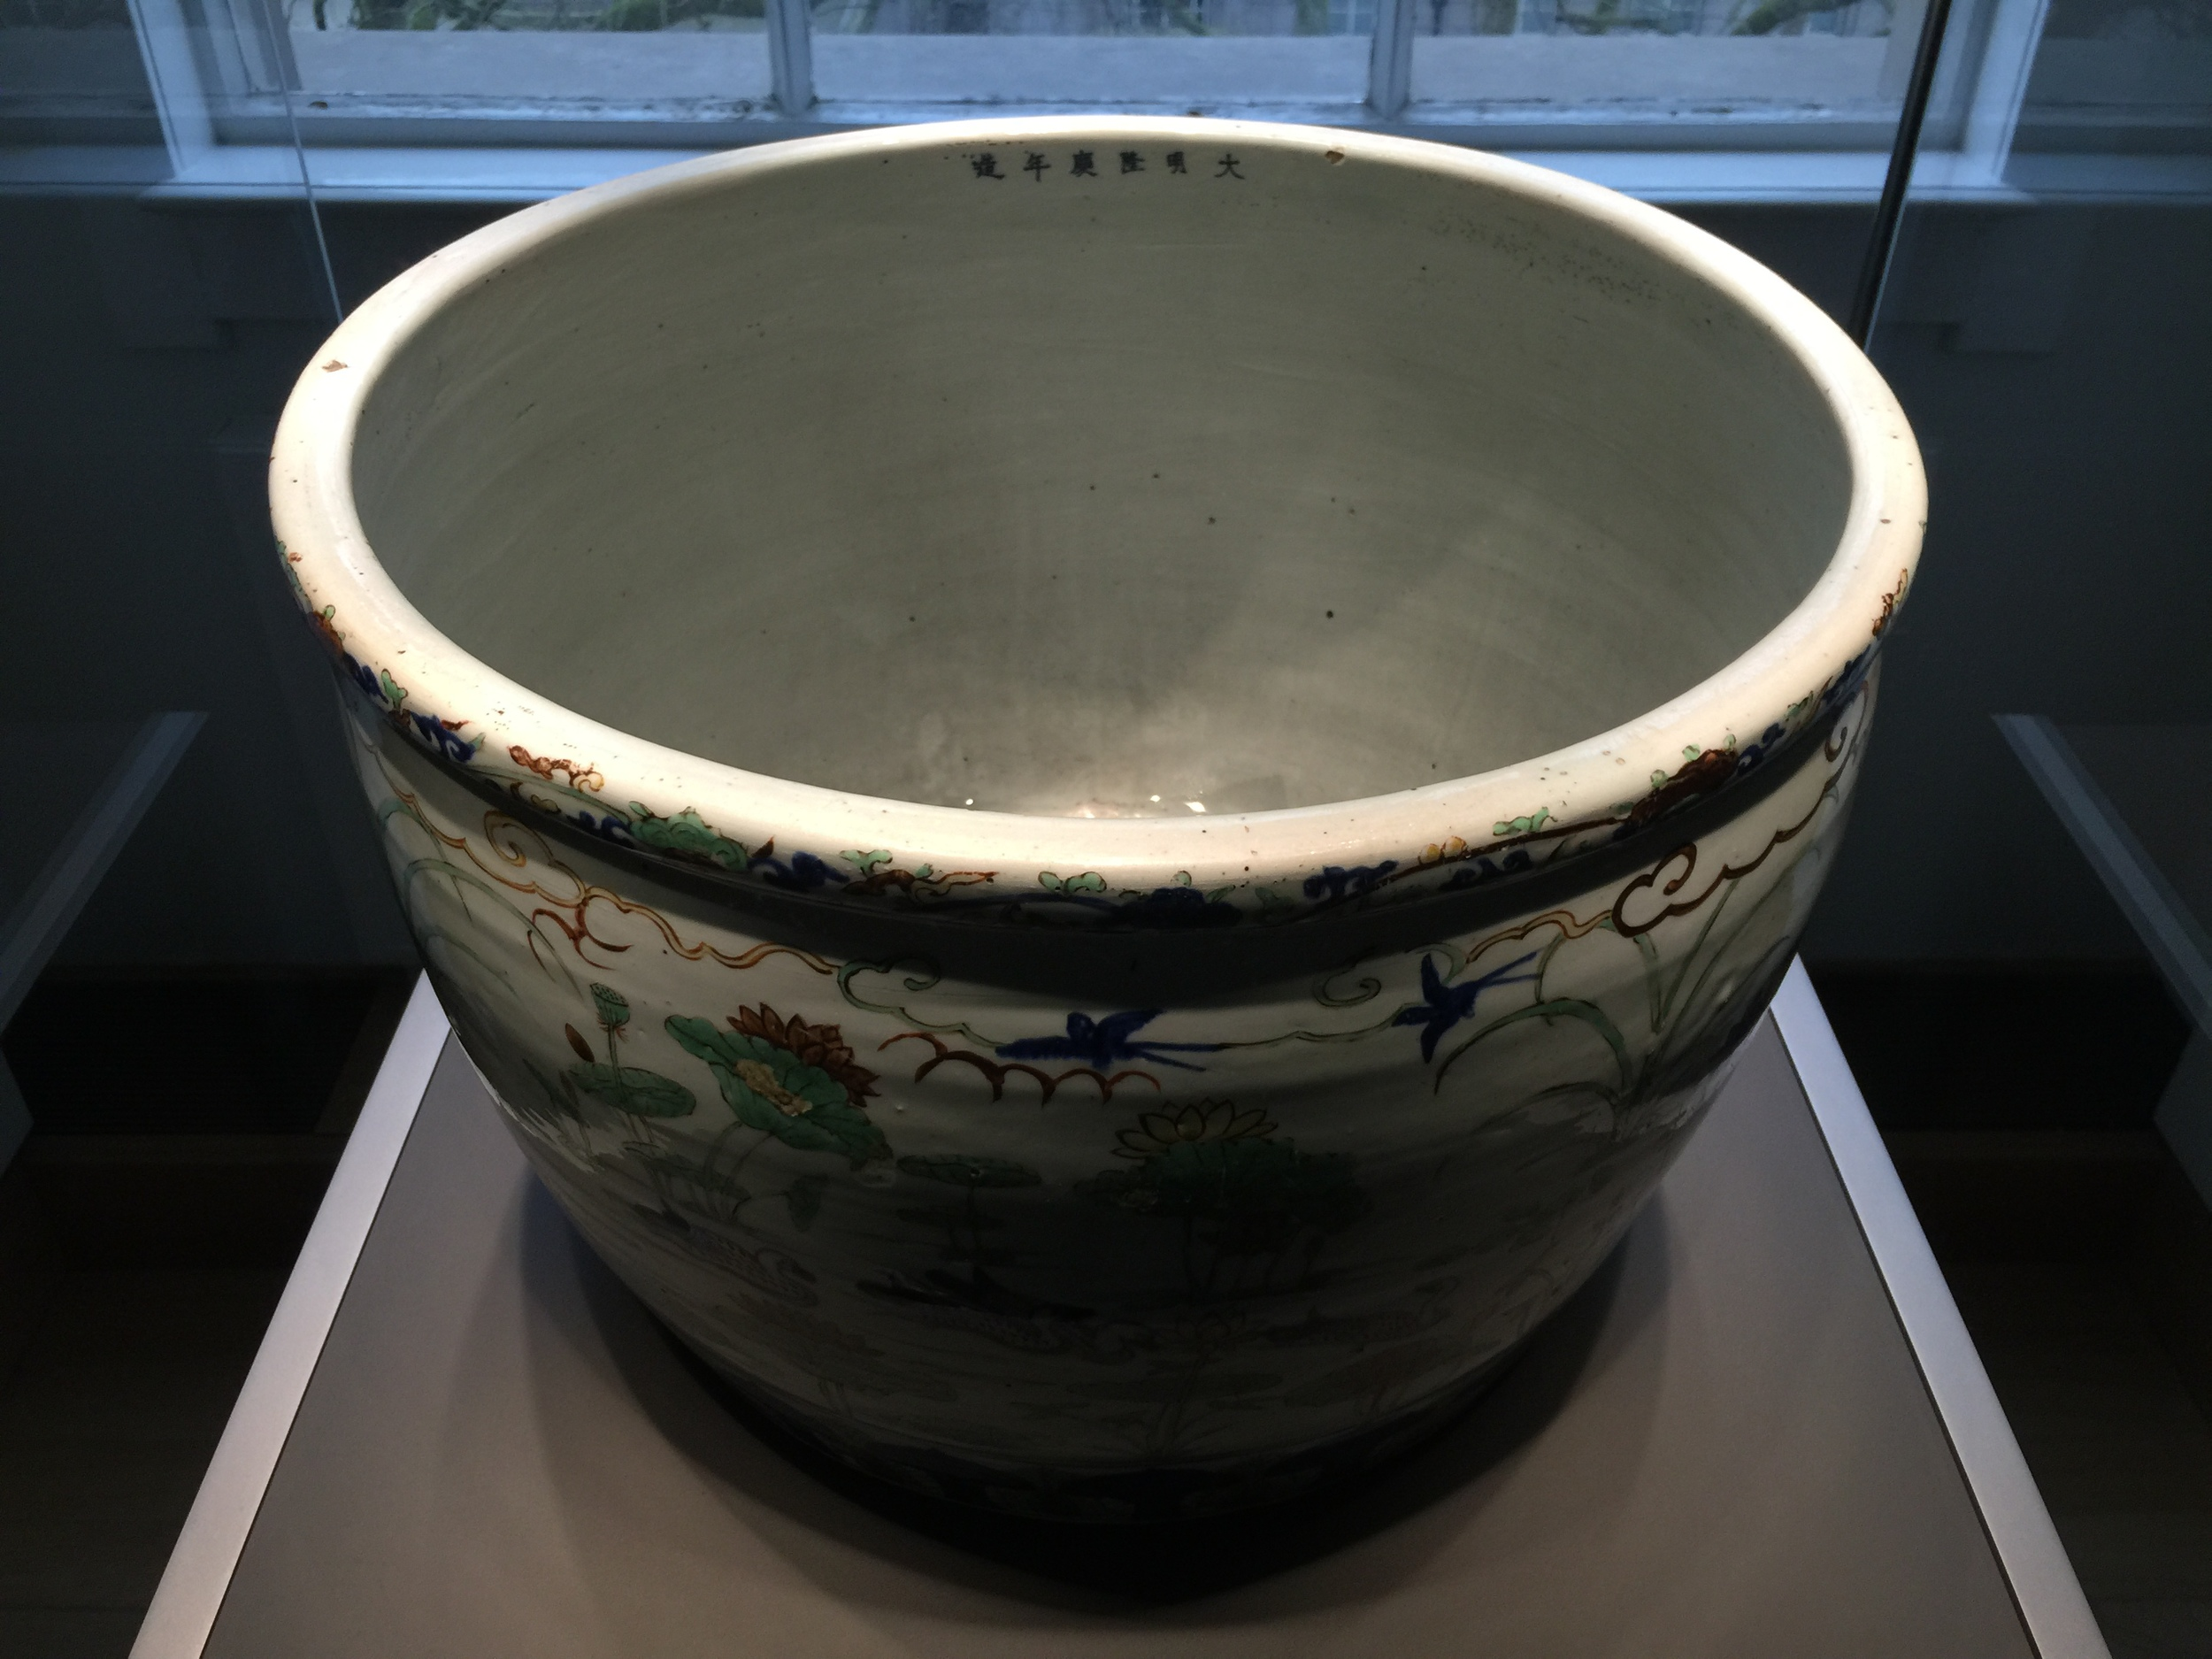 Chinese-Porcelain-British-Museum-Percival-David-jessewaugh.com-20.jpg